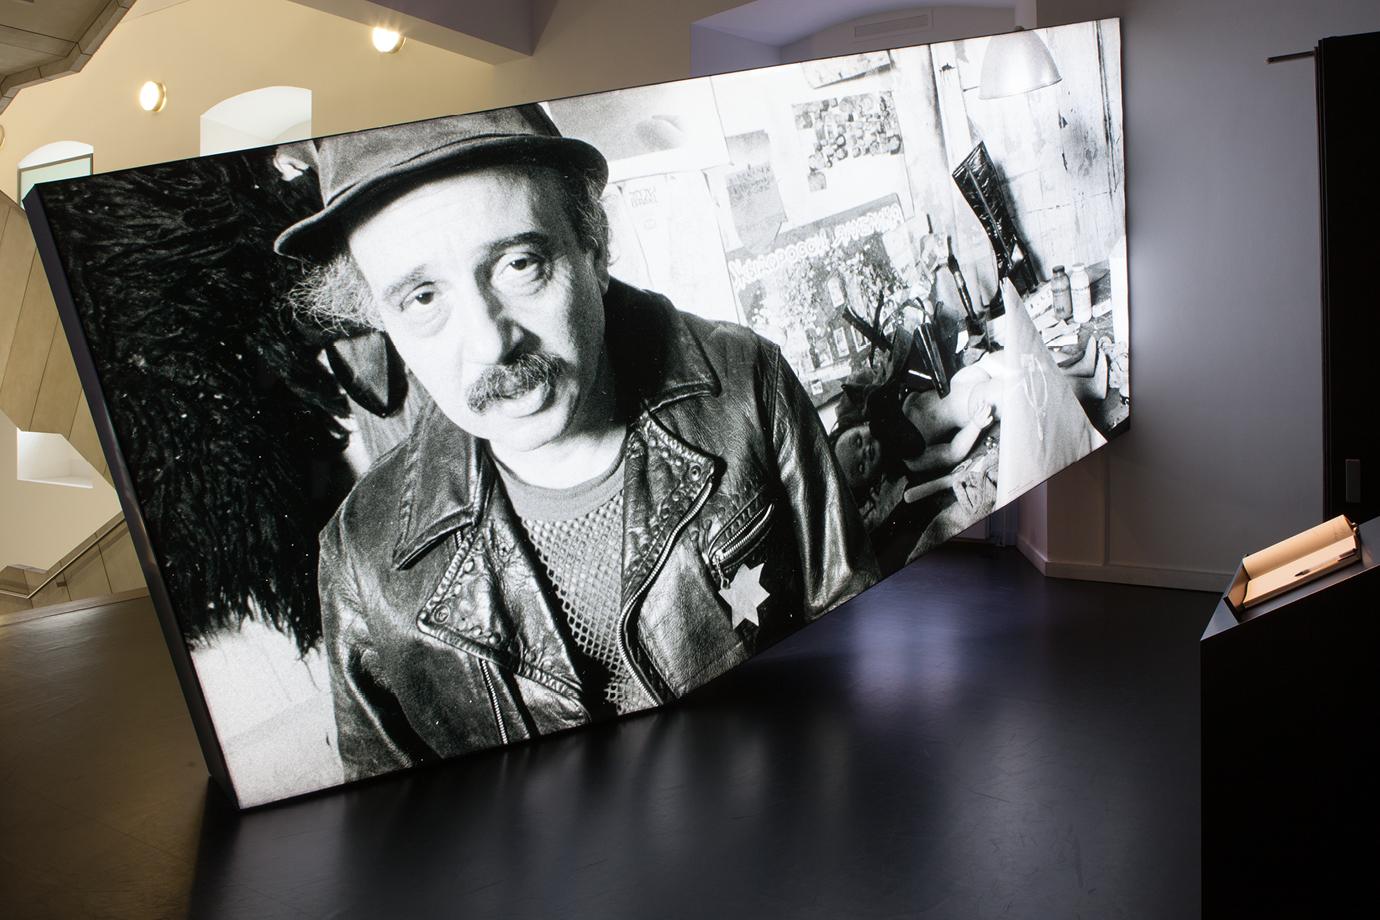 http://e-o-t.de/wordpress/wp-content/uploads/2017/03/Slide-Exhibition_Lurie_10-1.jpg